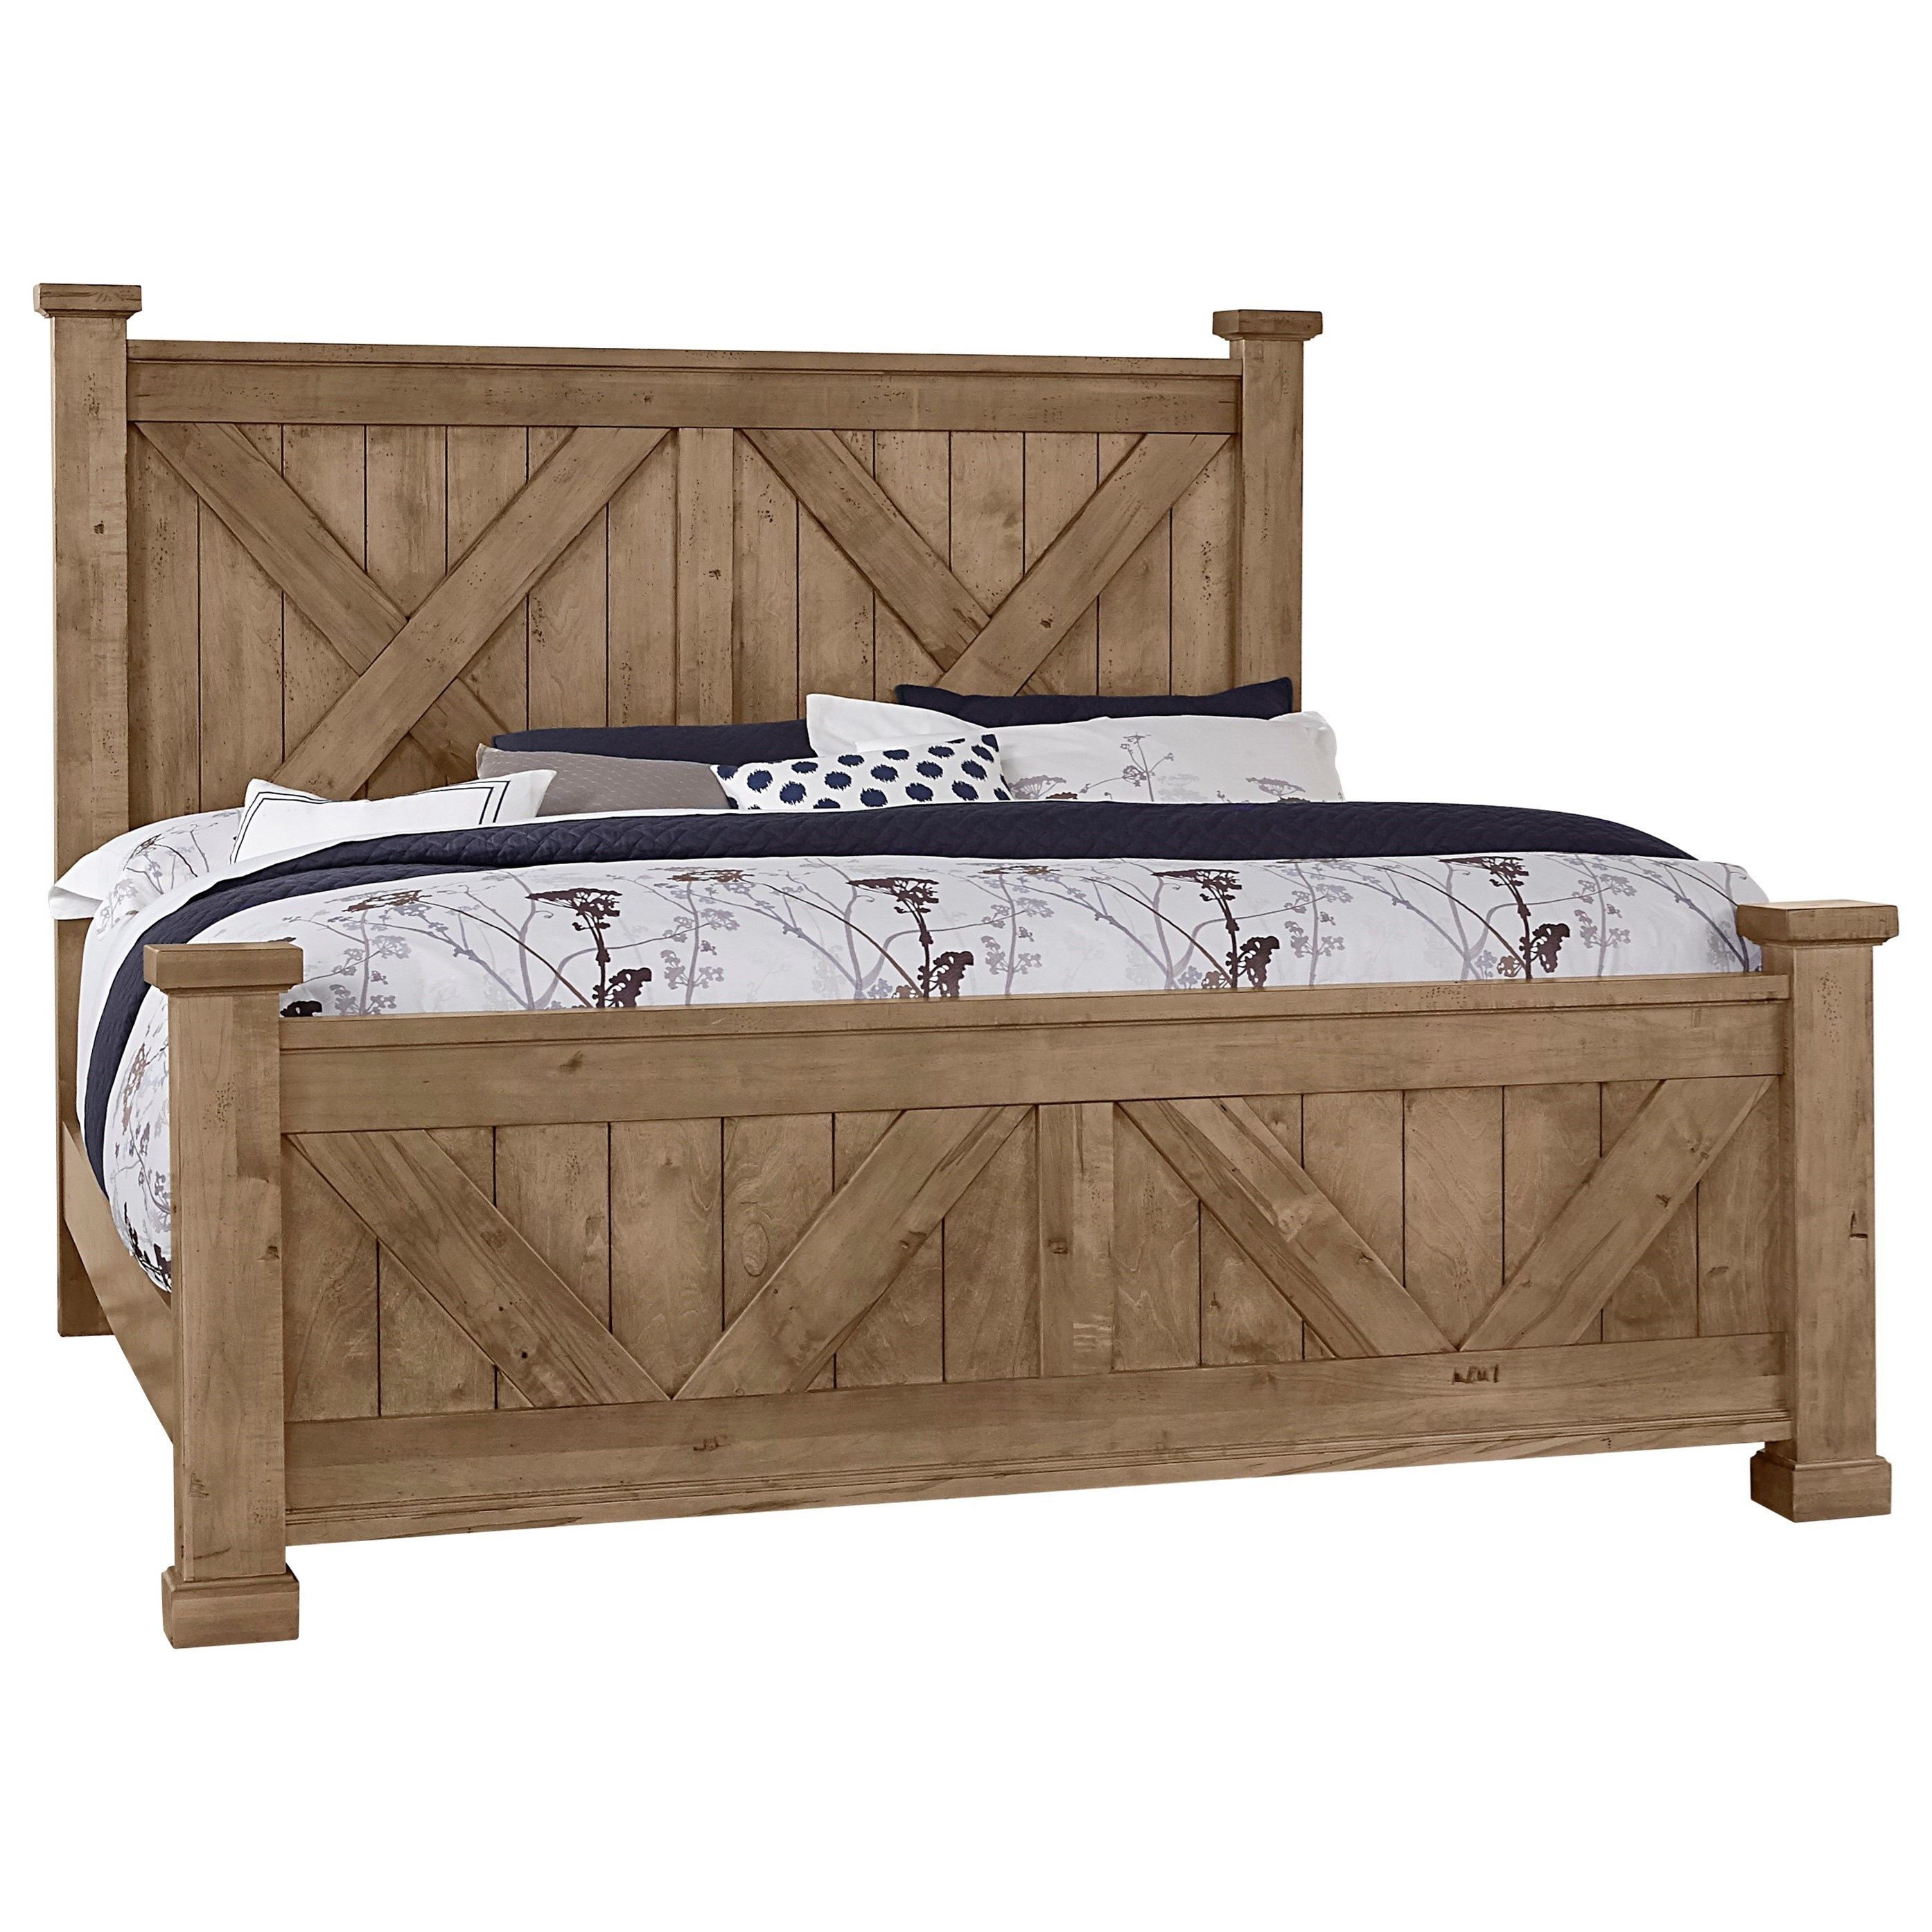 Cool Rustic Queen Barndoor X Bed by Artisan & Post at Northeast Factory Direct